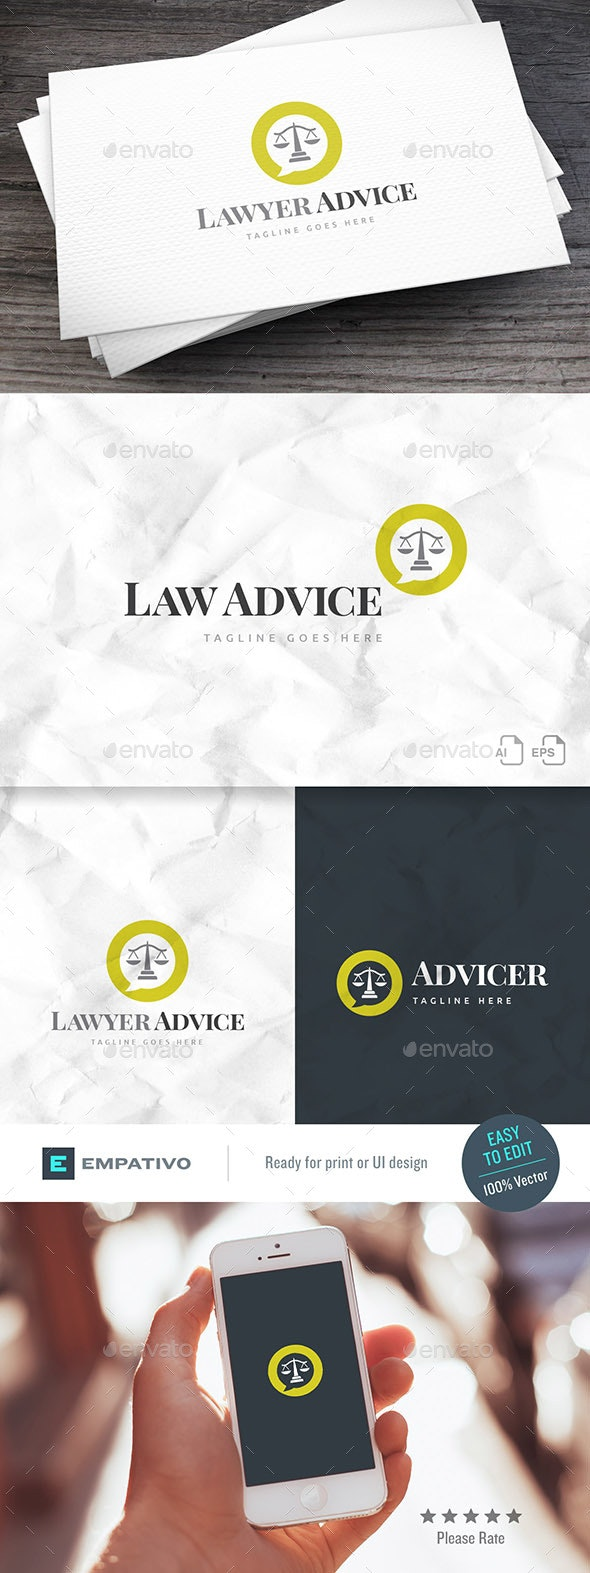 Lawyer Advice Logo Template - Symbols Logo Templates